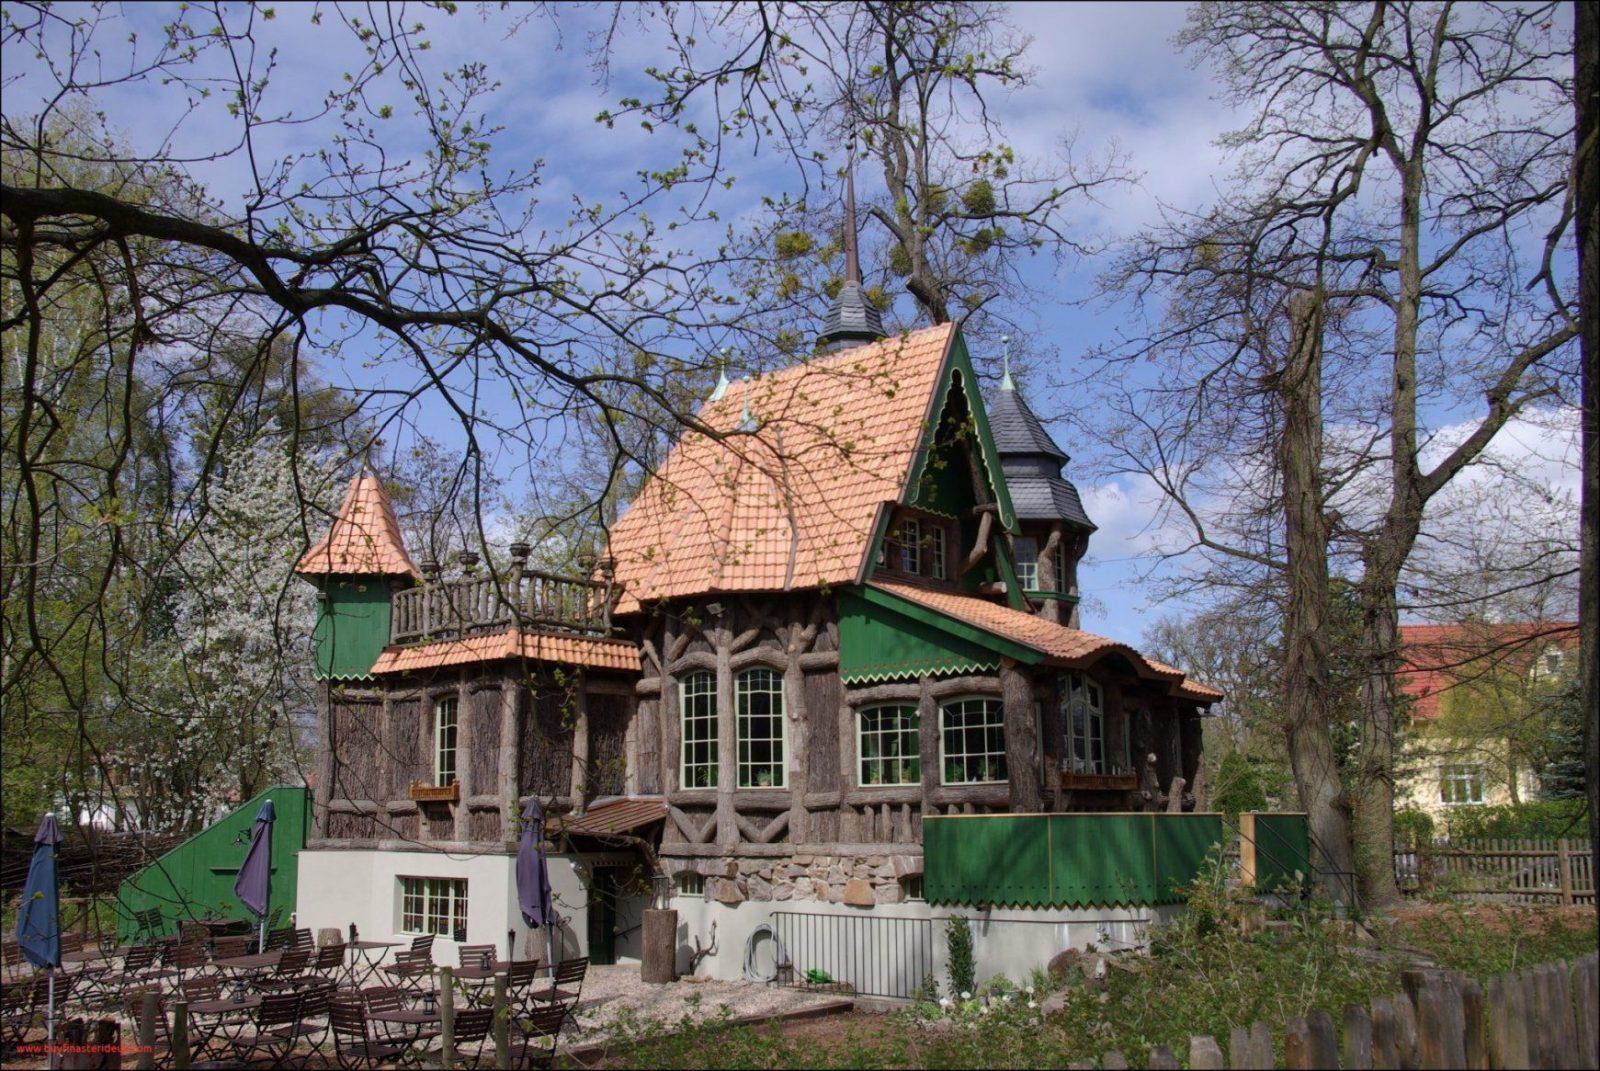 5 Beautiful Plan Haus Kaufen In Falkensee  Wallpaper Farbe Ideen von Haus Kaufen In Falkensee Von Privat Photo